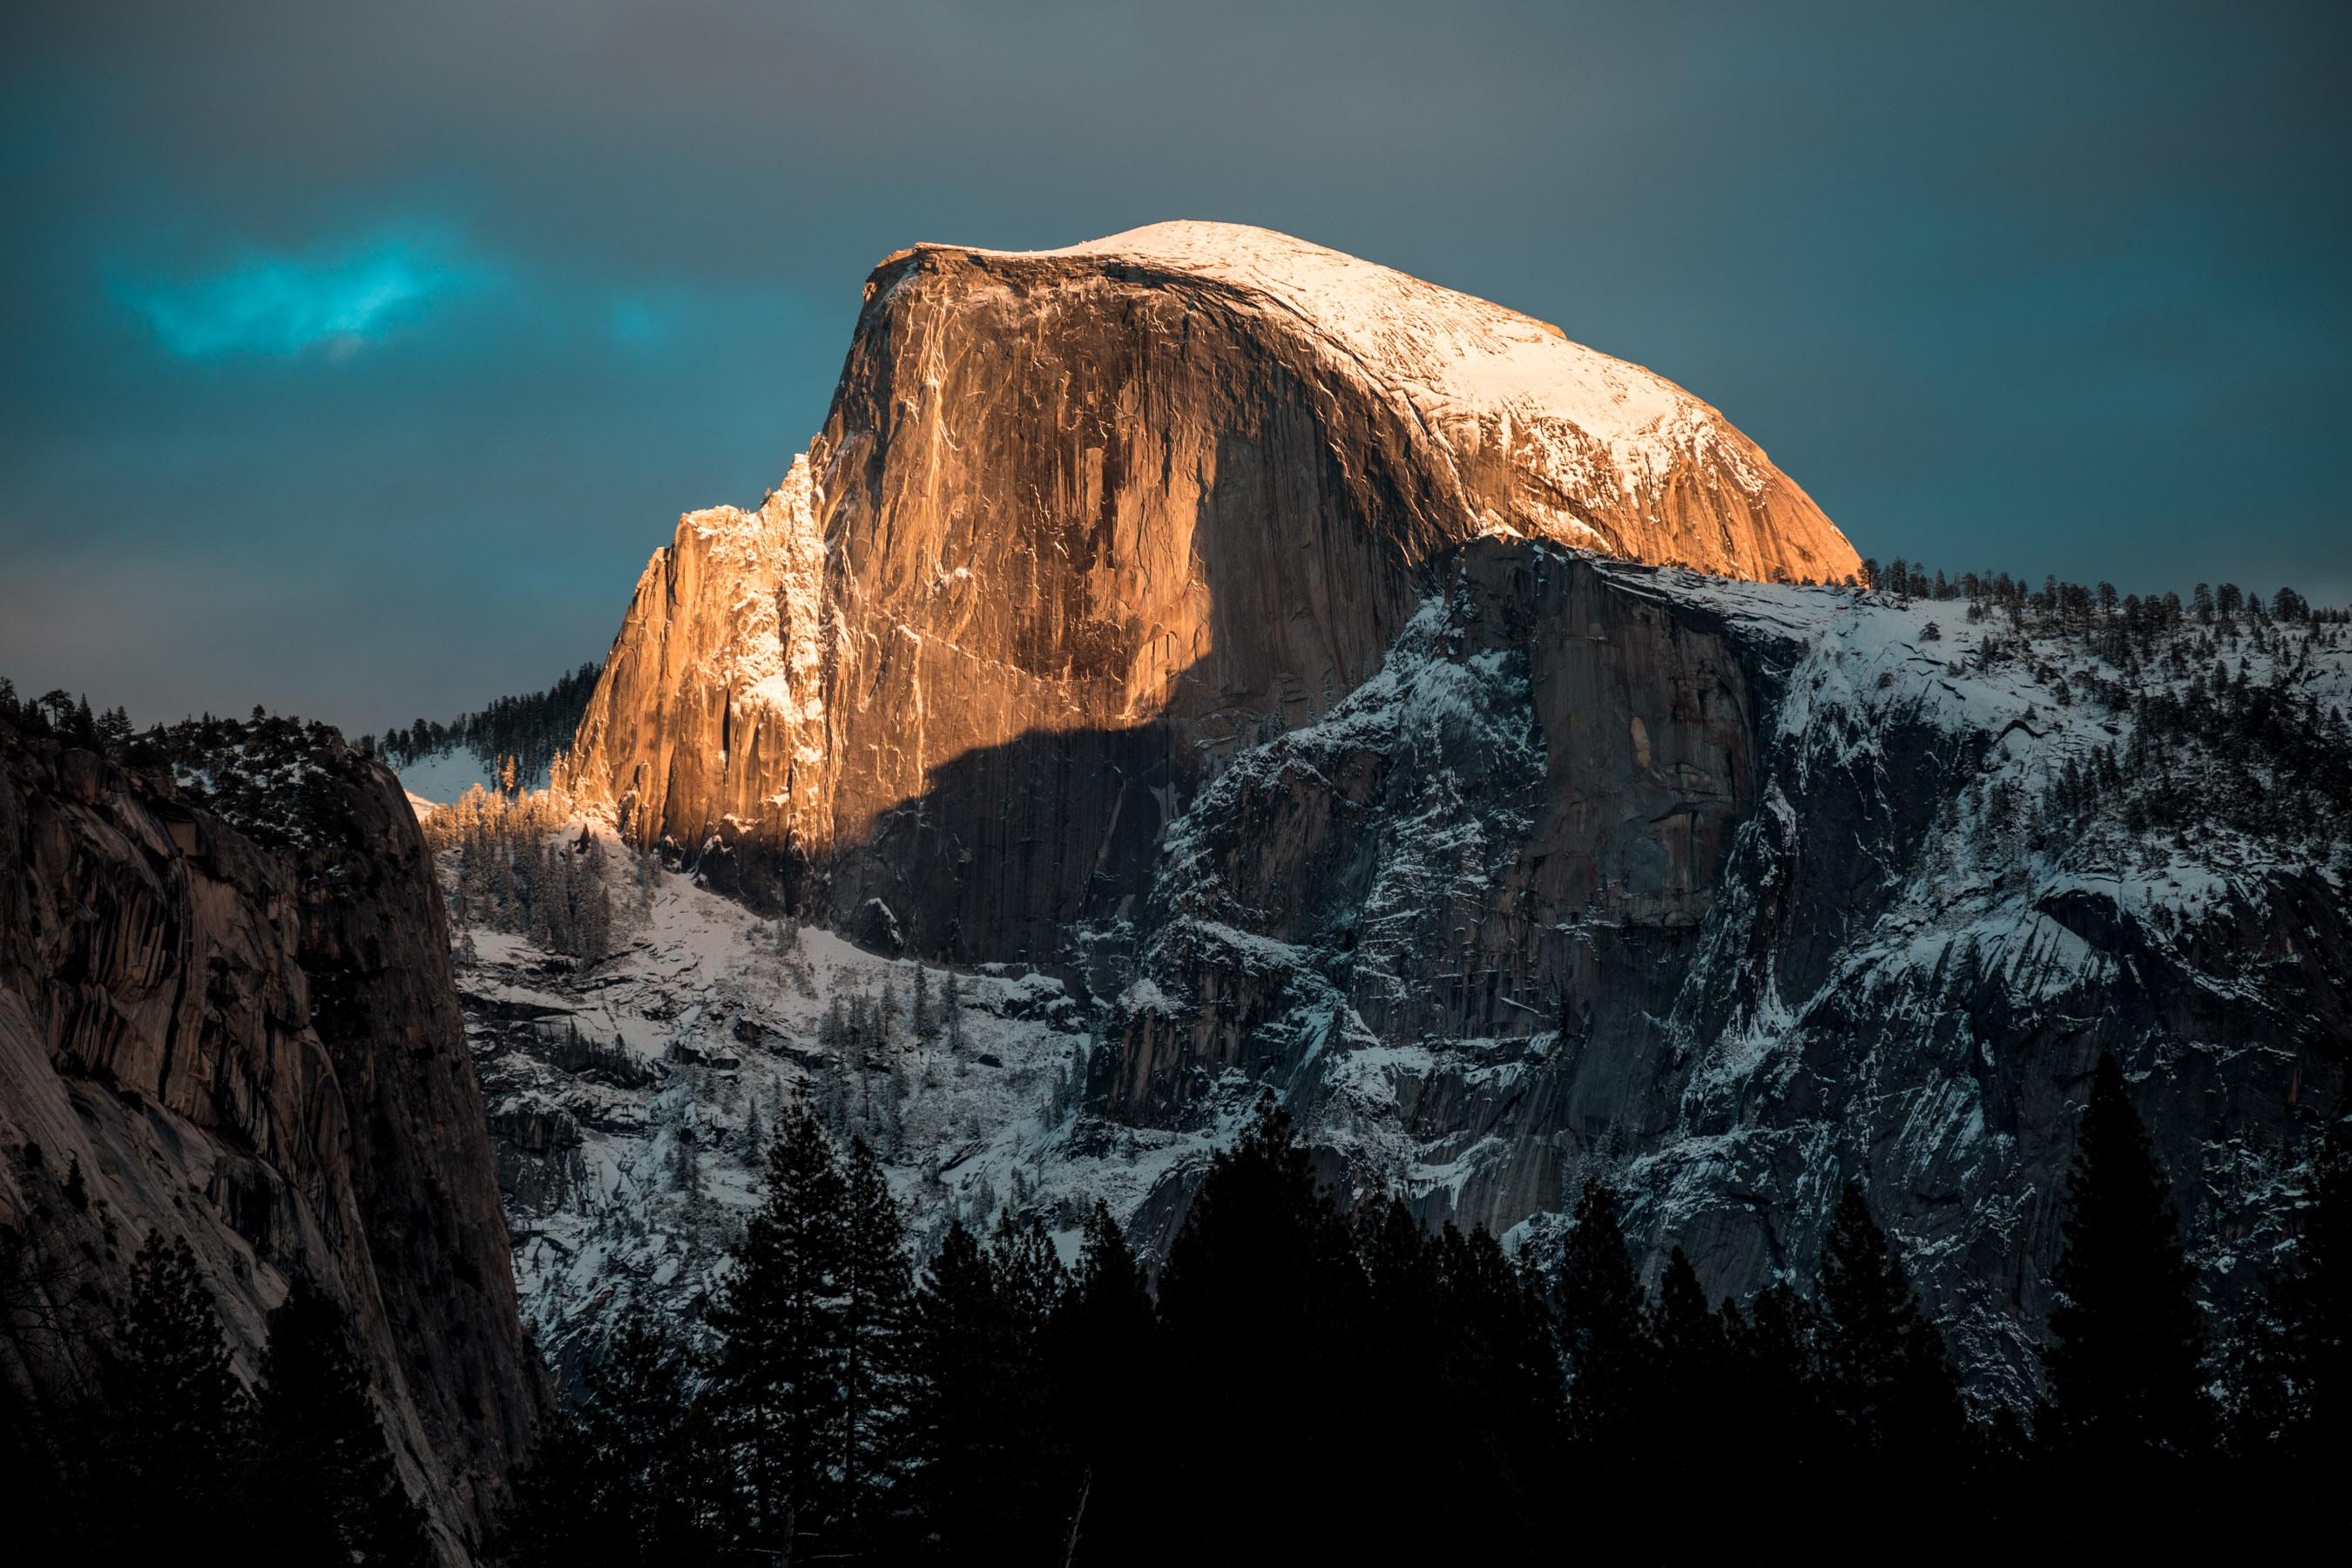 The sun lighting up a snowcapped Half Dome peak at California's Yosemite National Park